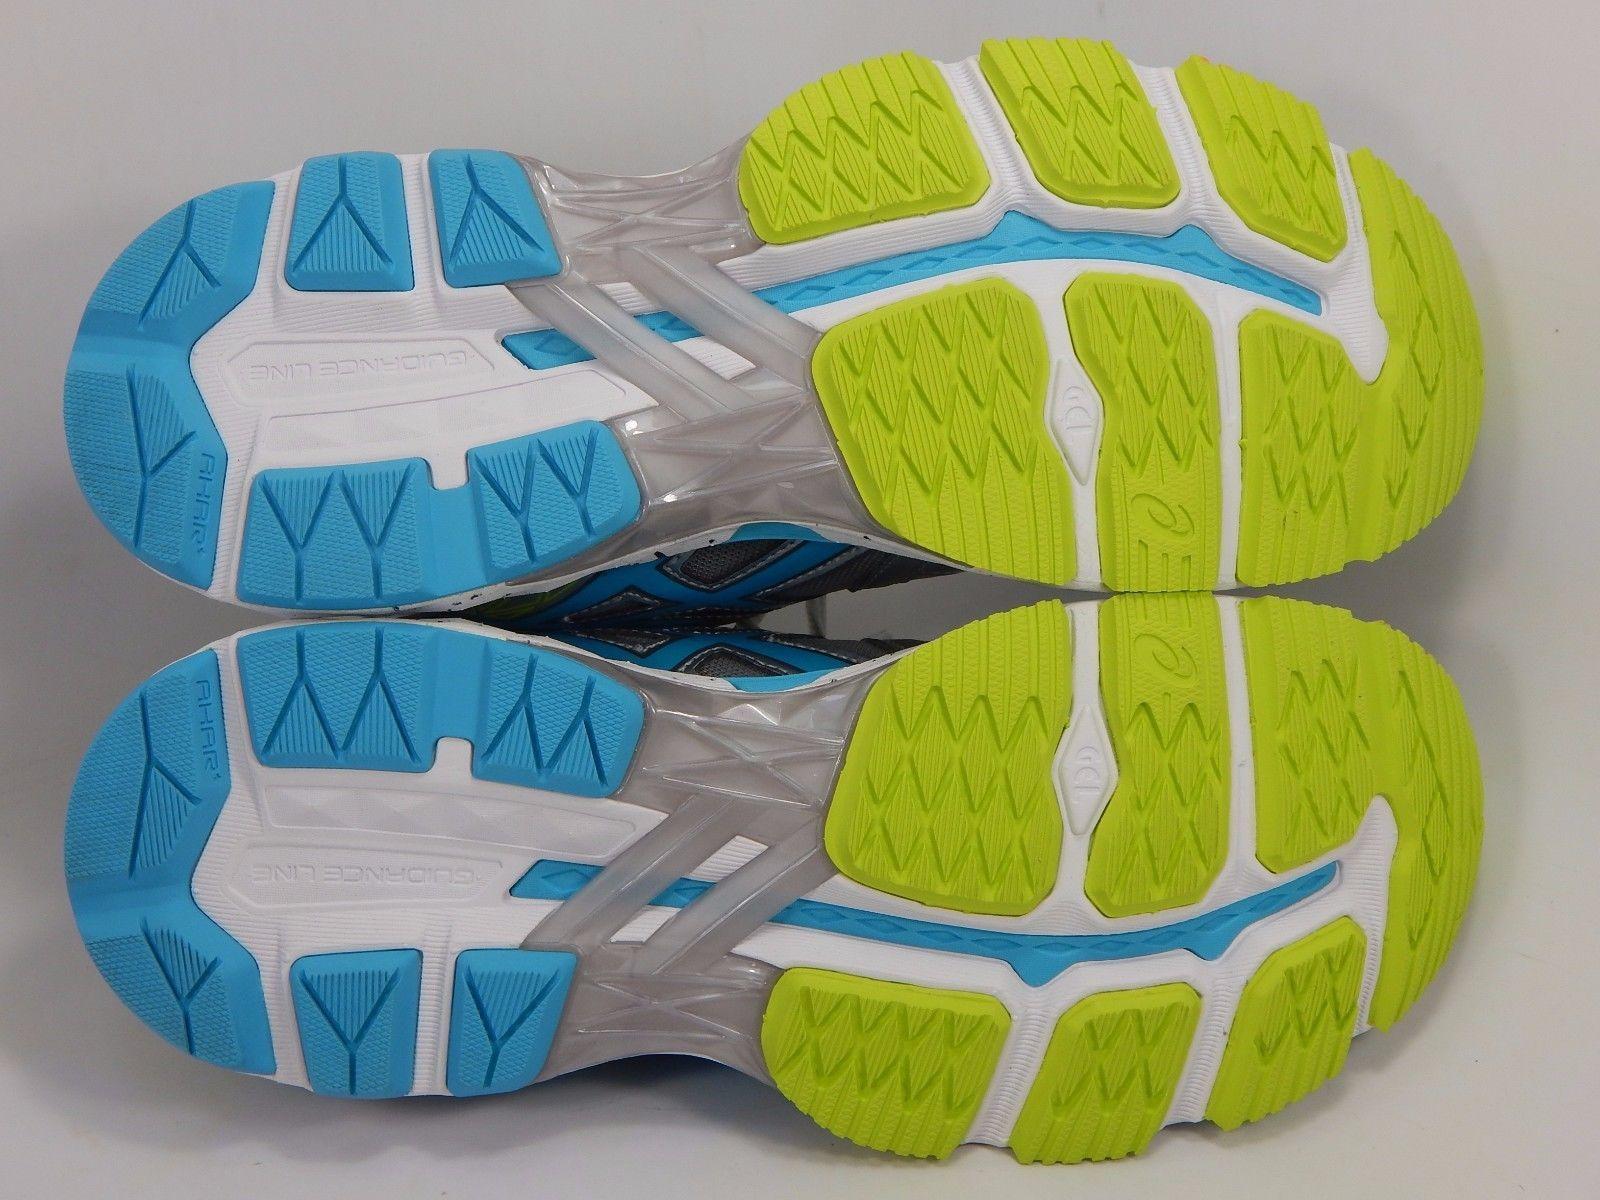 Asics GT 2000 v 4 Women's Running Shoes Size US 7.5 2A NARROW EU 39 Silver T659N